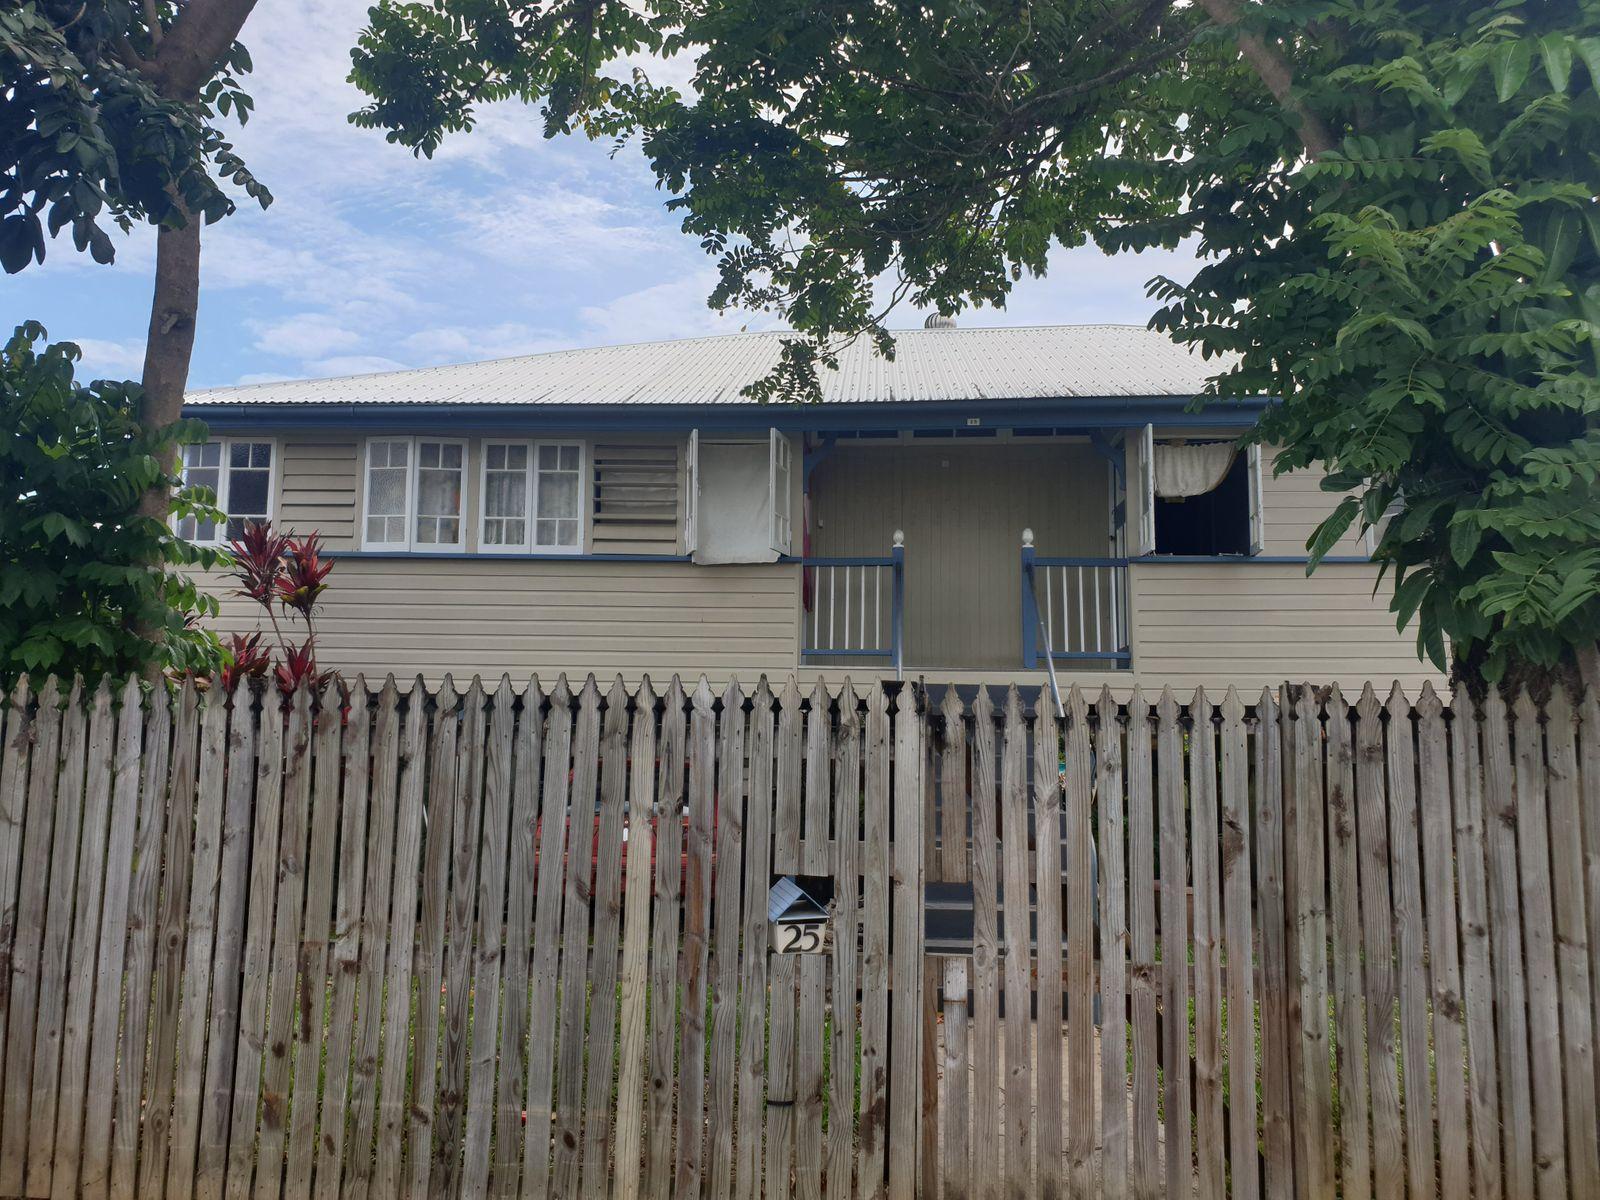 25 CHARLES STREET, Innisfail, QLD 4860